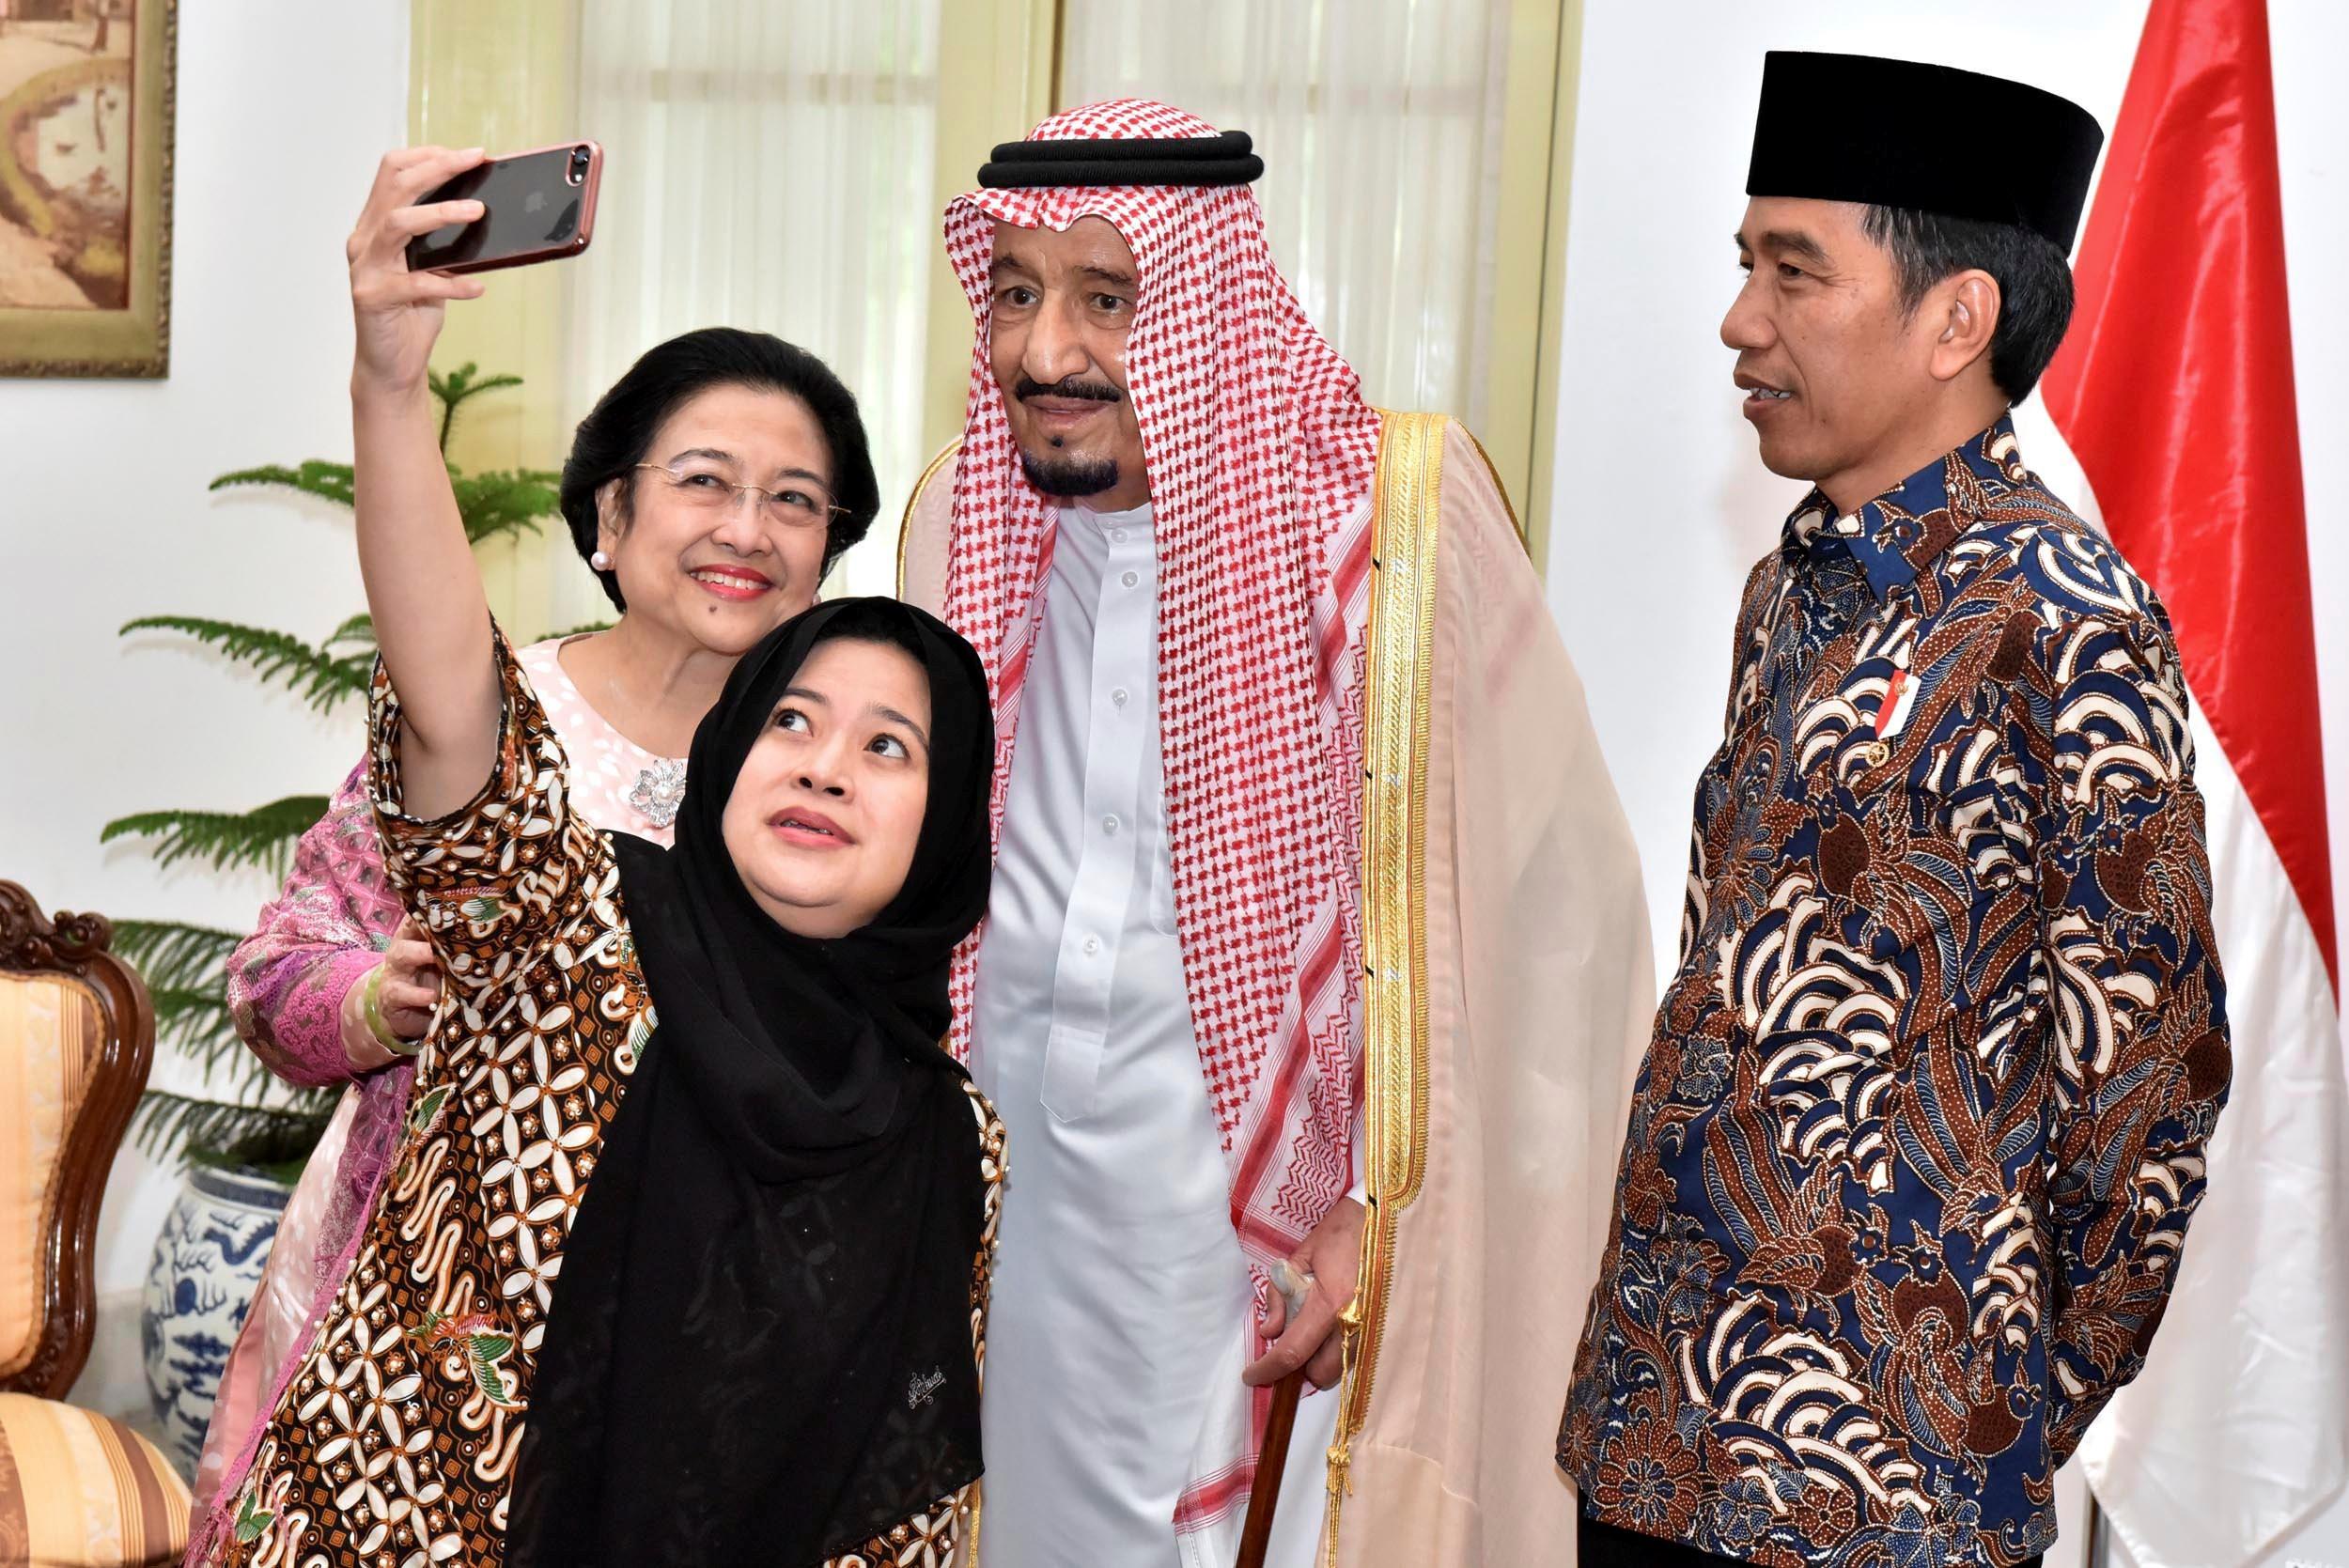 King Salman's Historic Visit to Indonesia: Mirror of a Changing Saudi Arabia